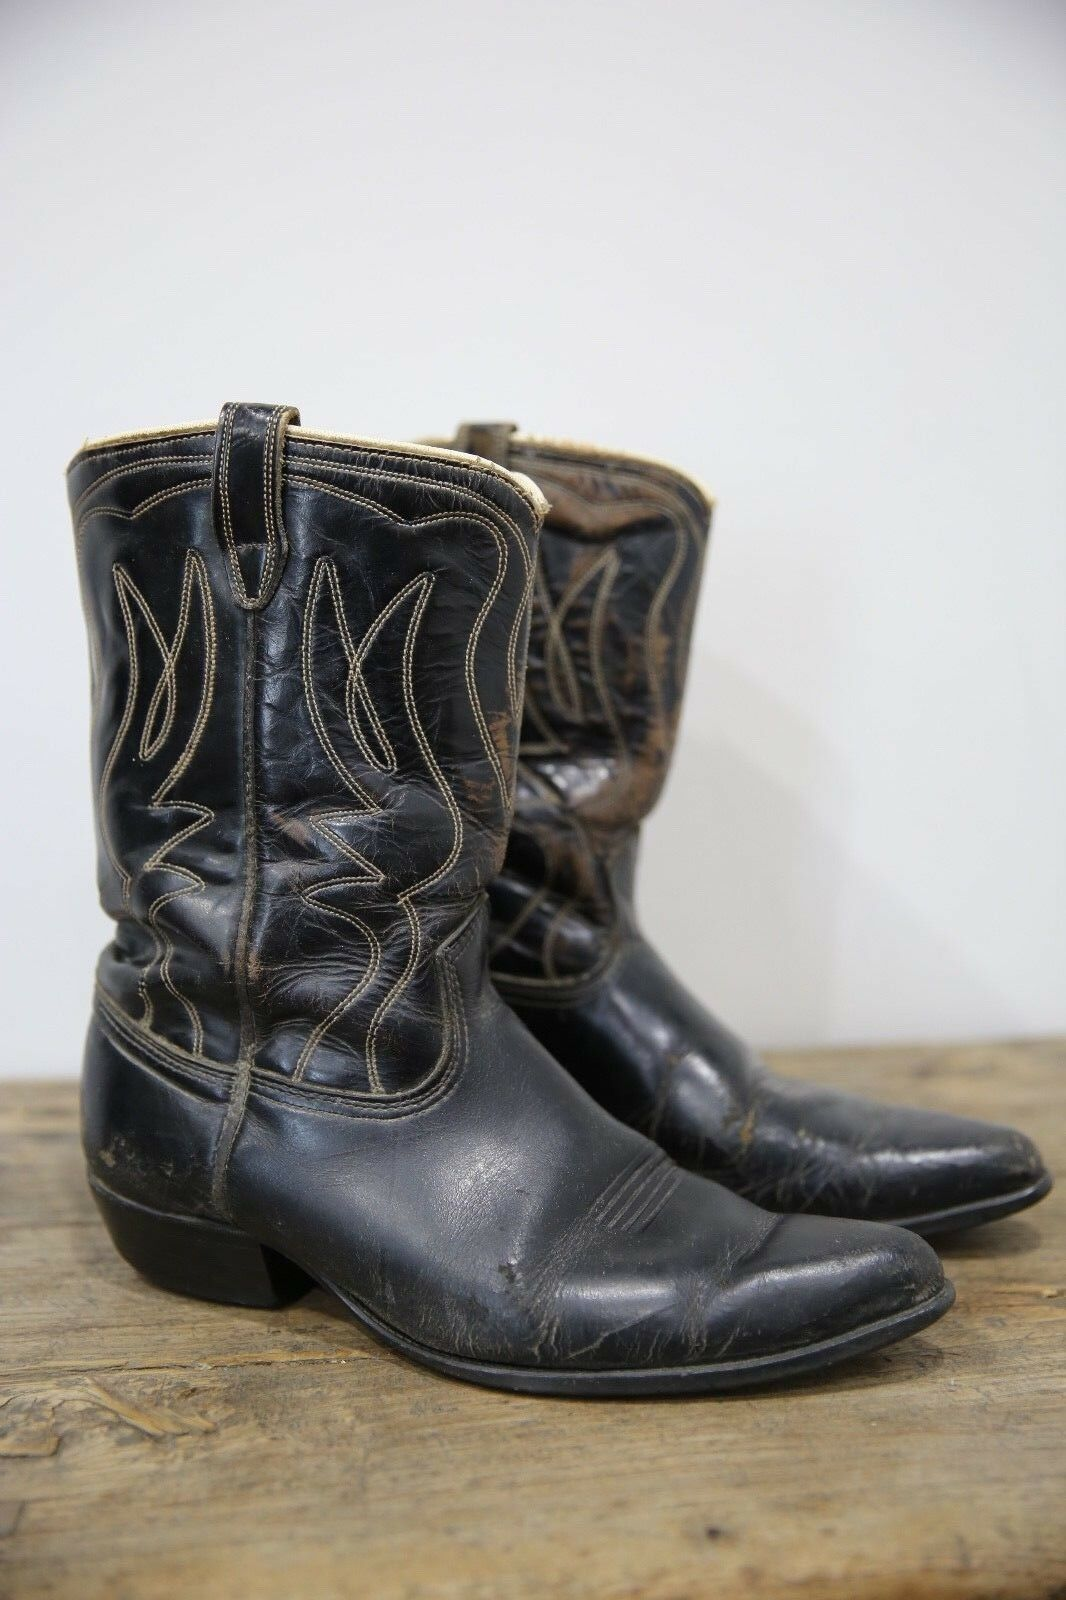 De Colección negro STITCHED STITCHED STITCHED Cowboy Cowgirl País Occidental botas del suroeste  grandes ofertas